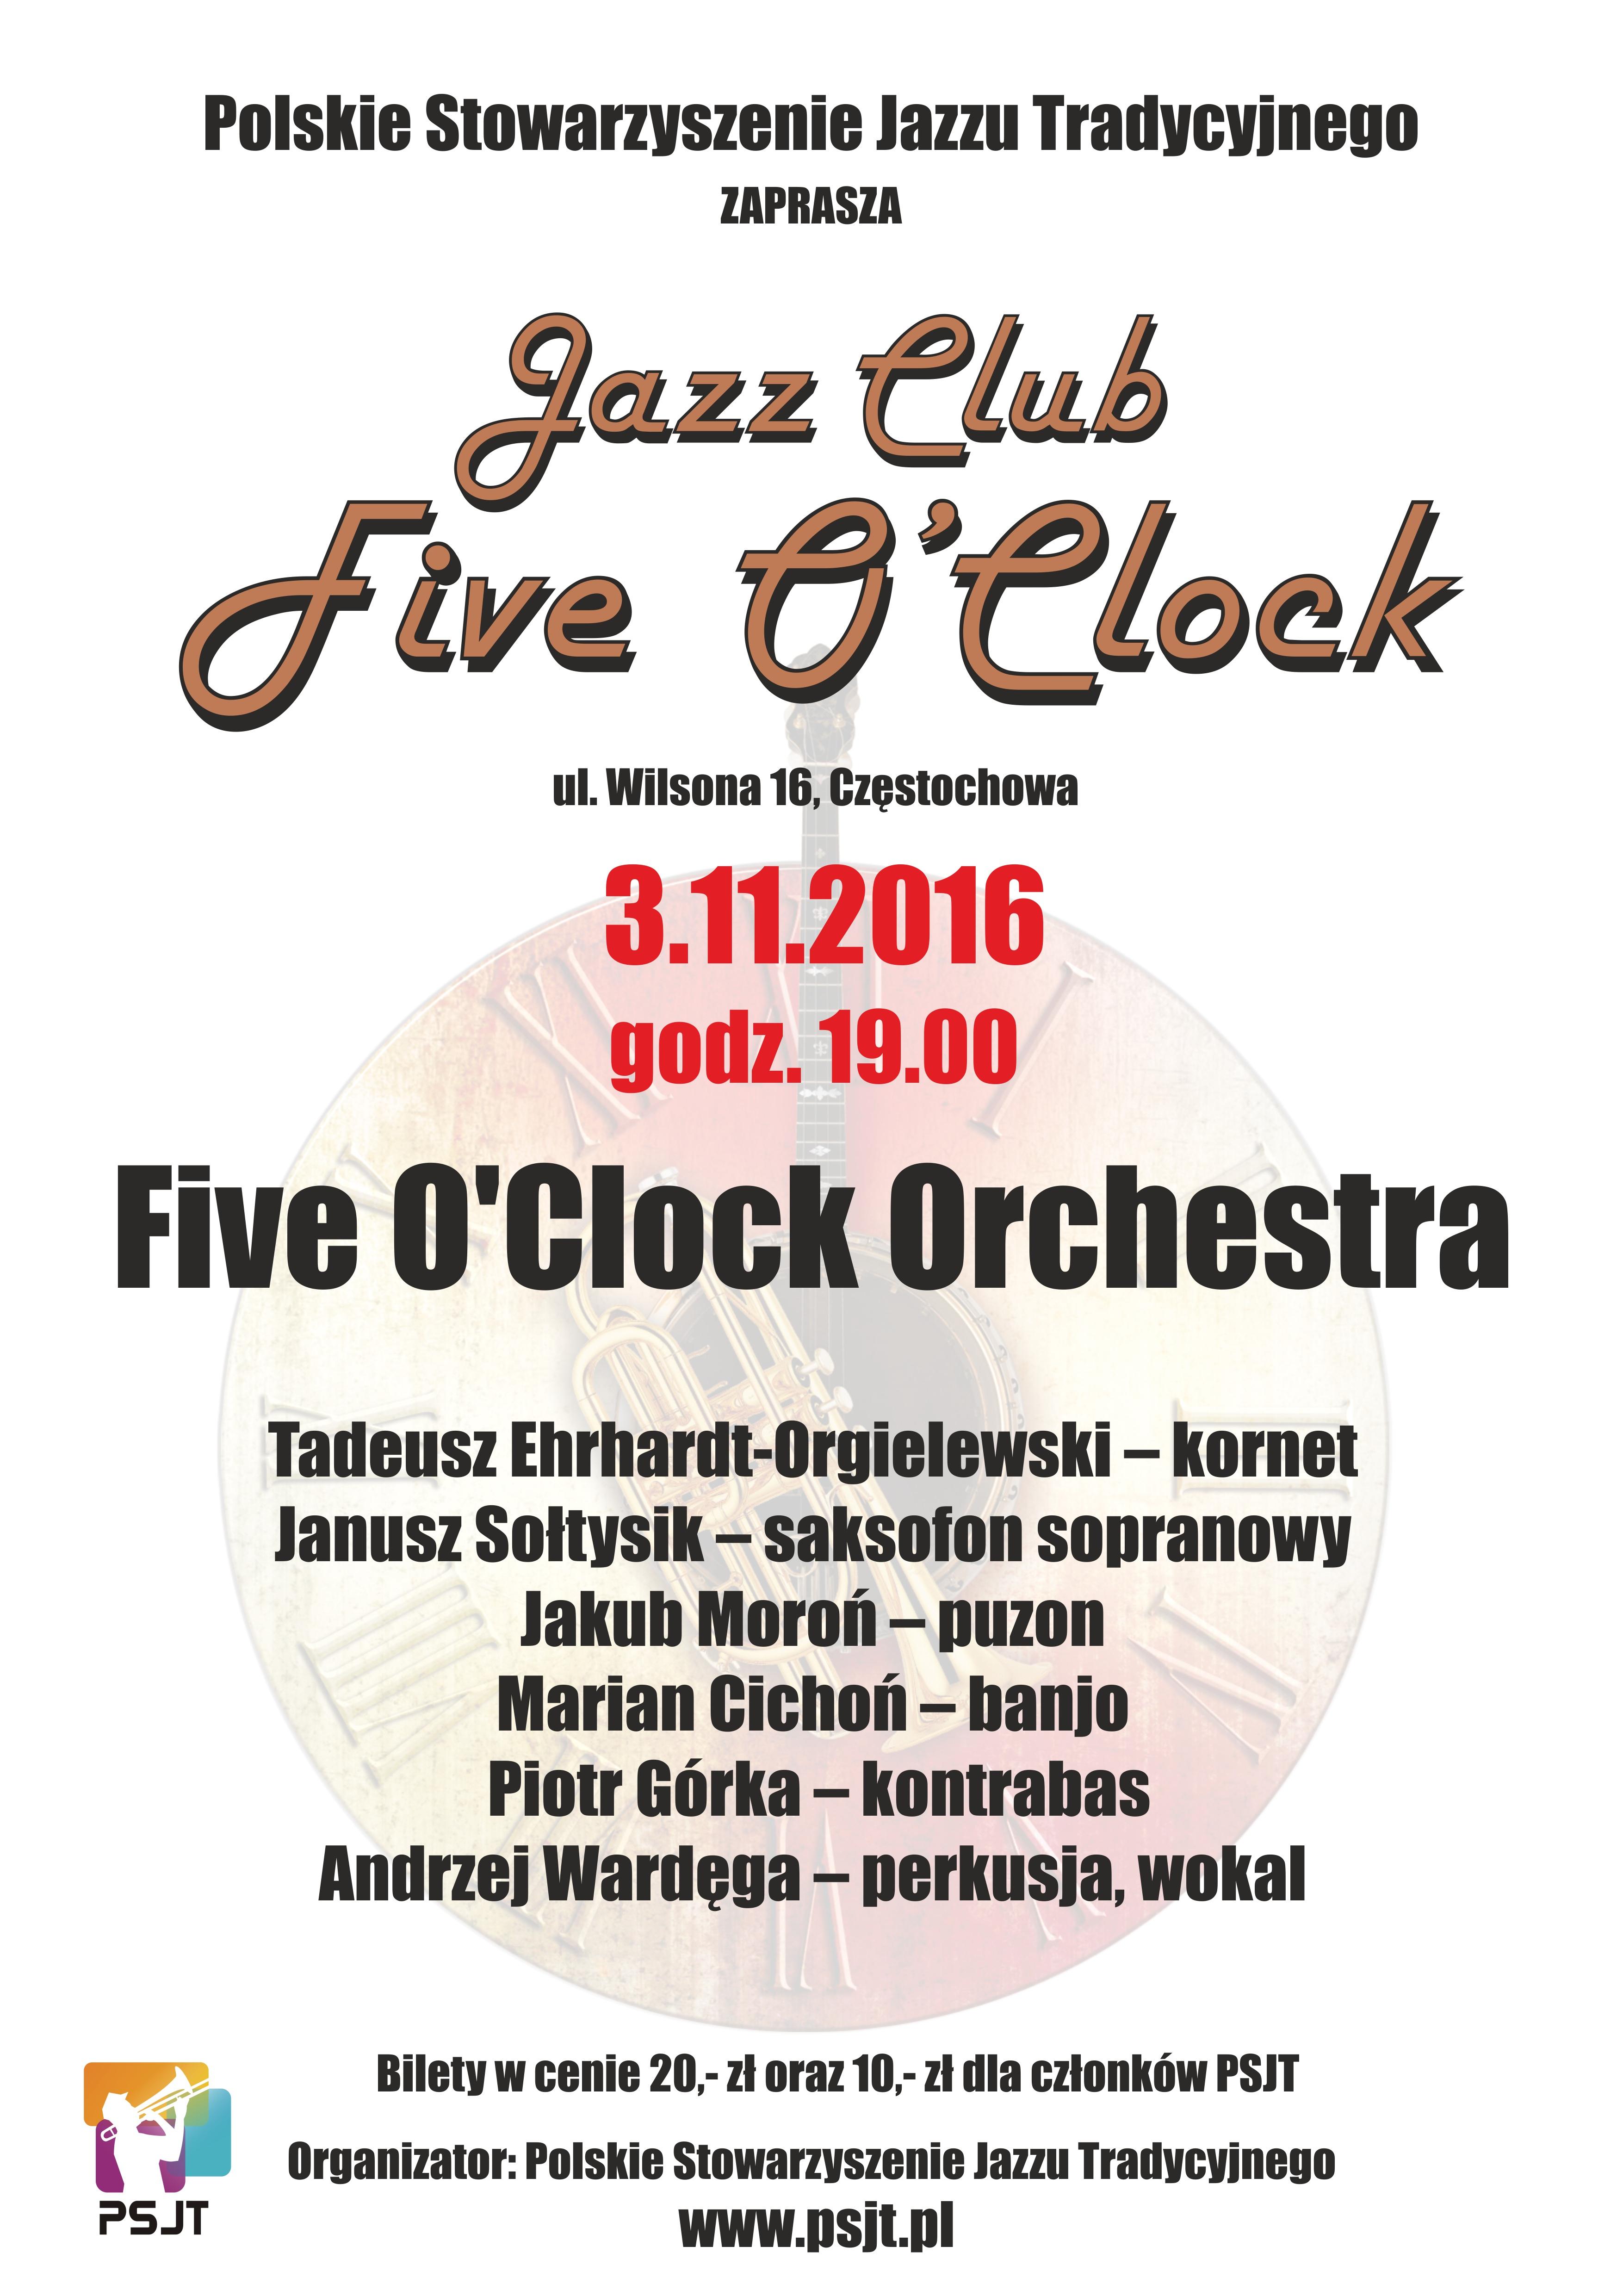 five-o-clock-orchestra-listopad-2016-5-kopia